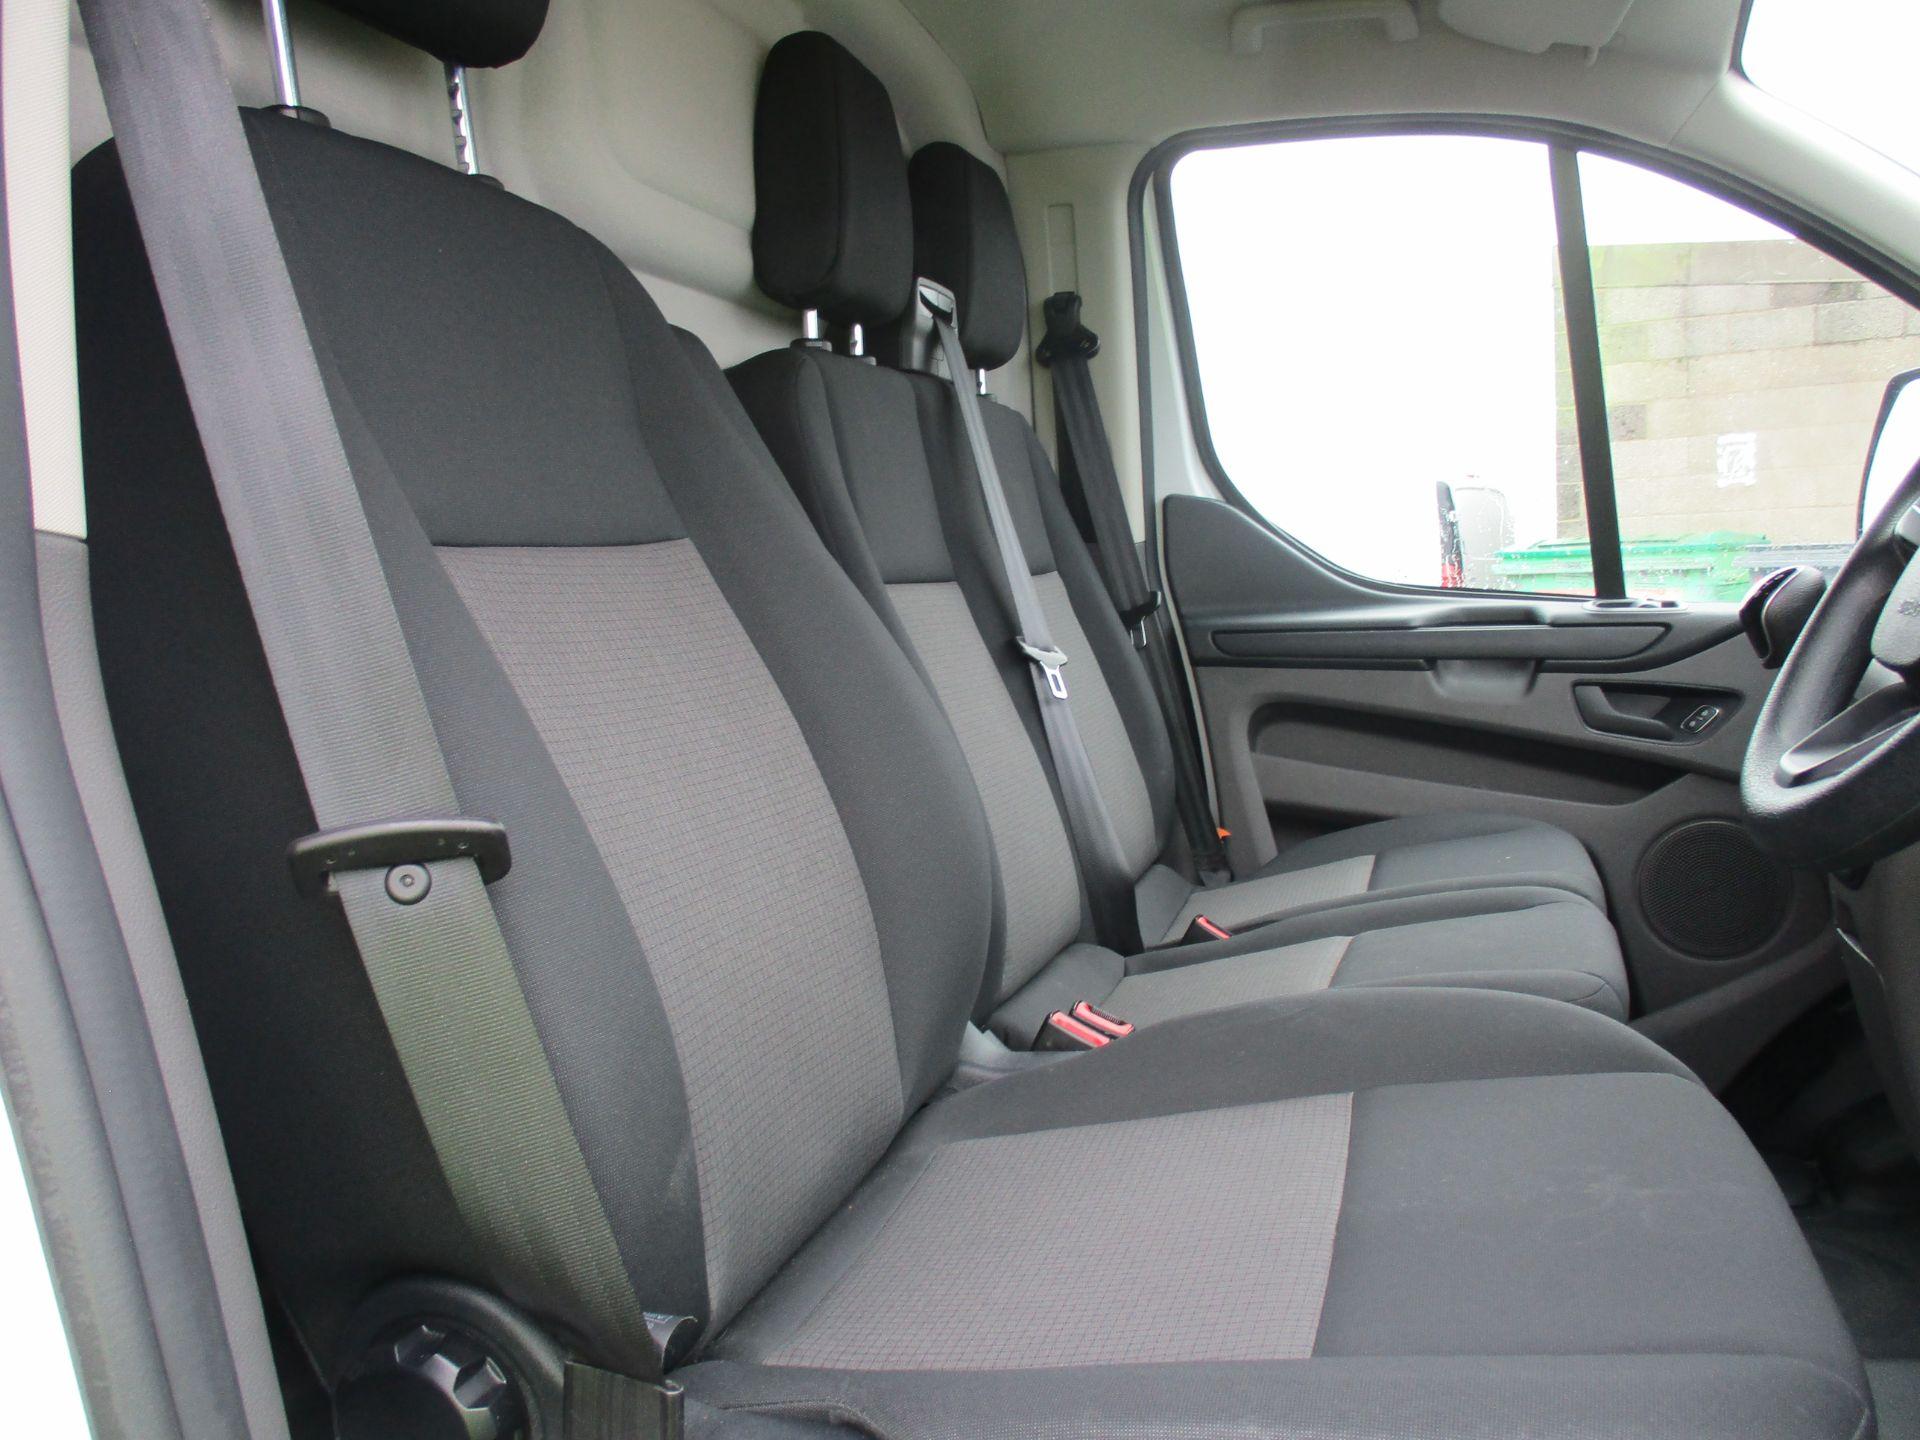 2018 Ford Transit Custom 300 L1 DIESEL FWD 2.0 TDCI 105PS LOW ROOF VAN EURO 6 (FL68AHC) Image 12